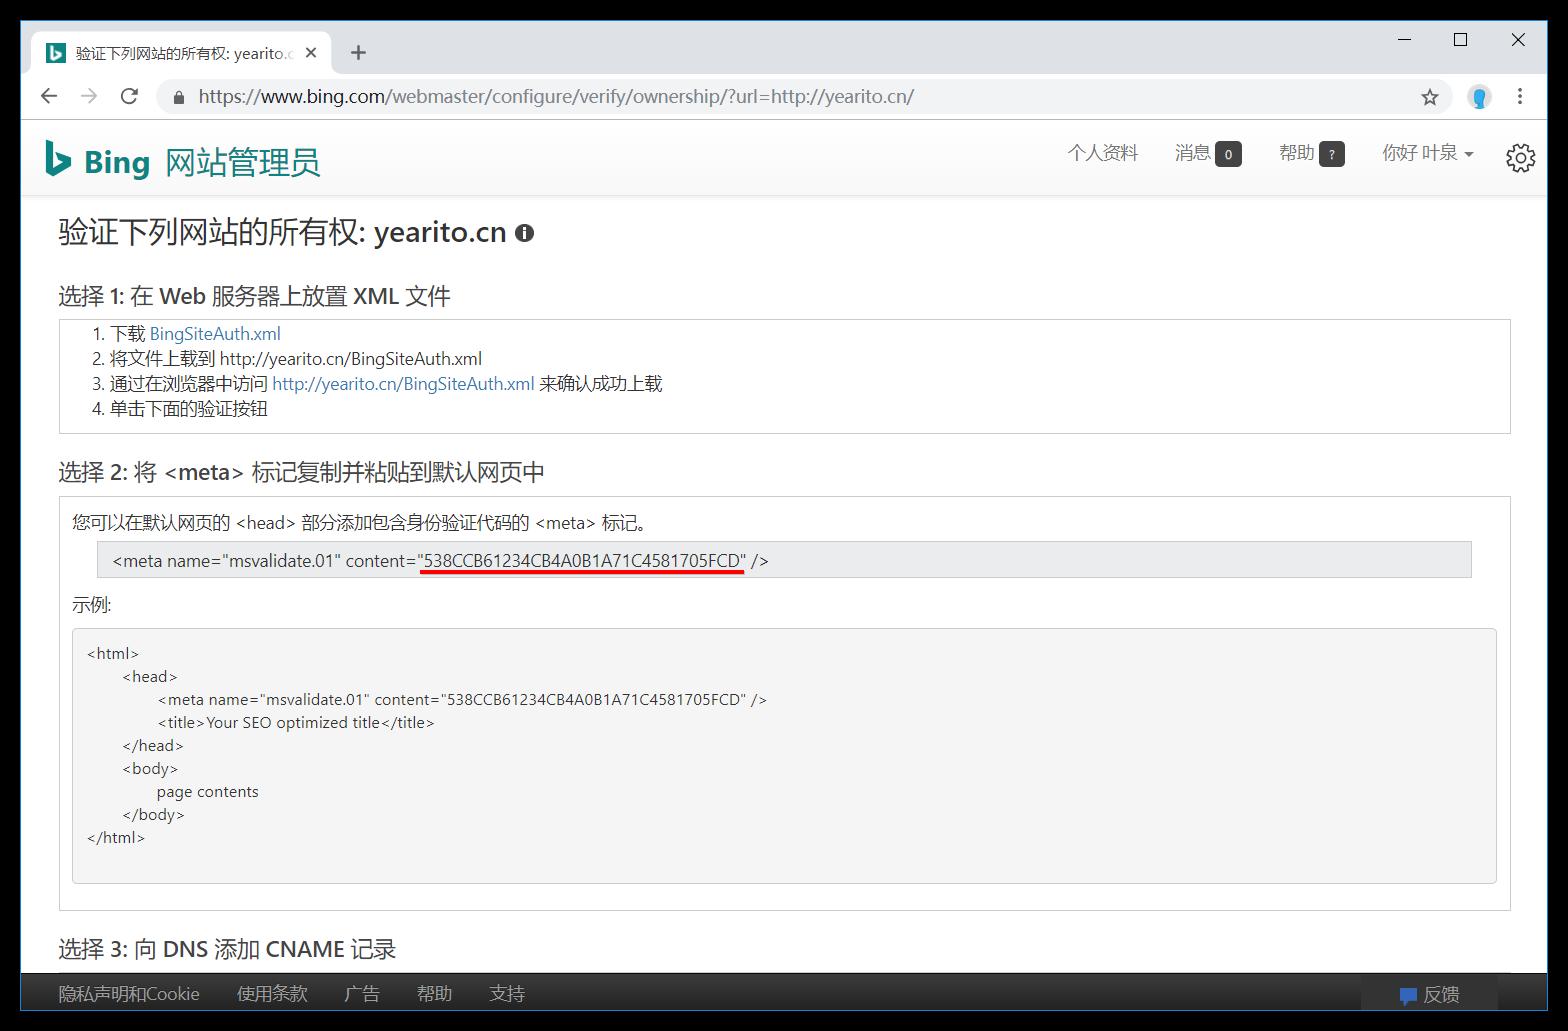 Bing 选择验证方式